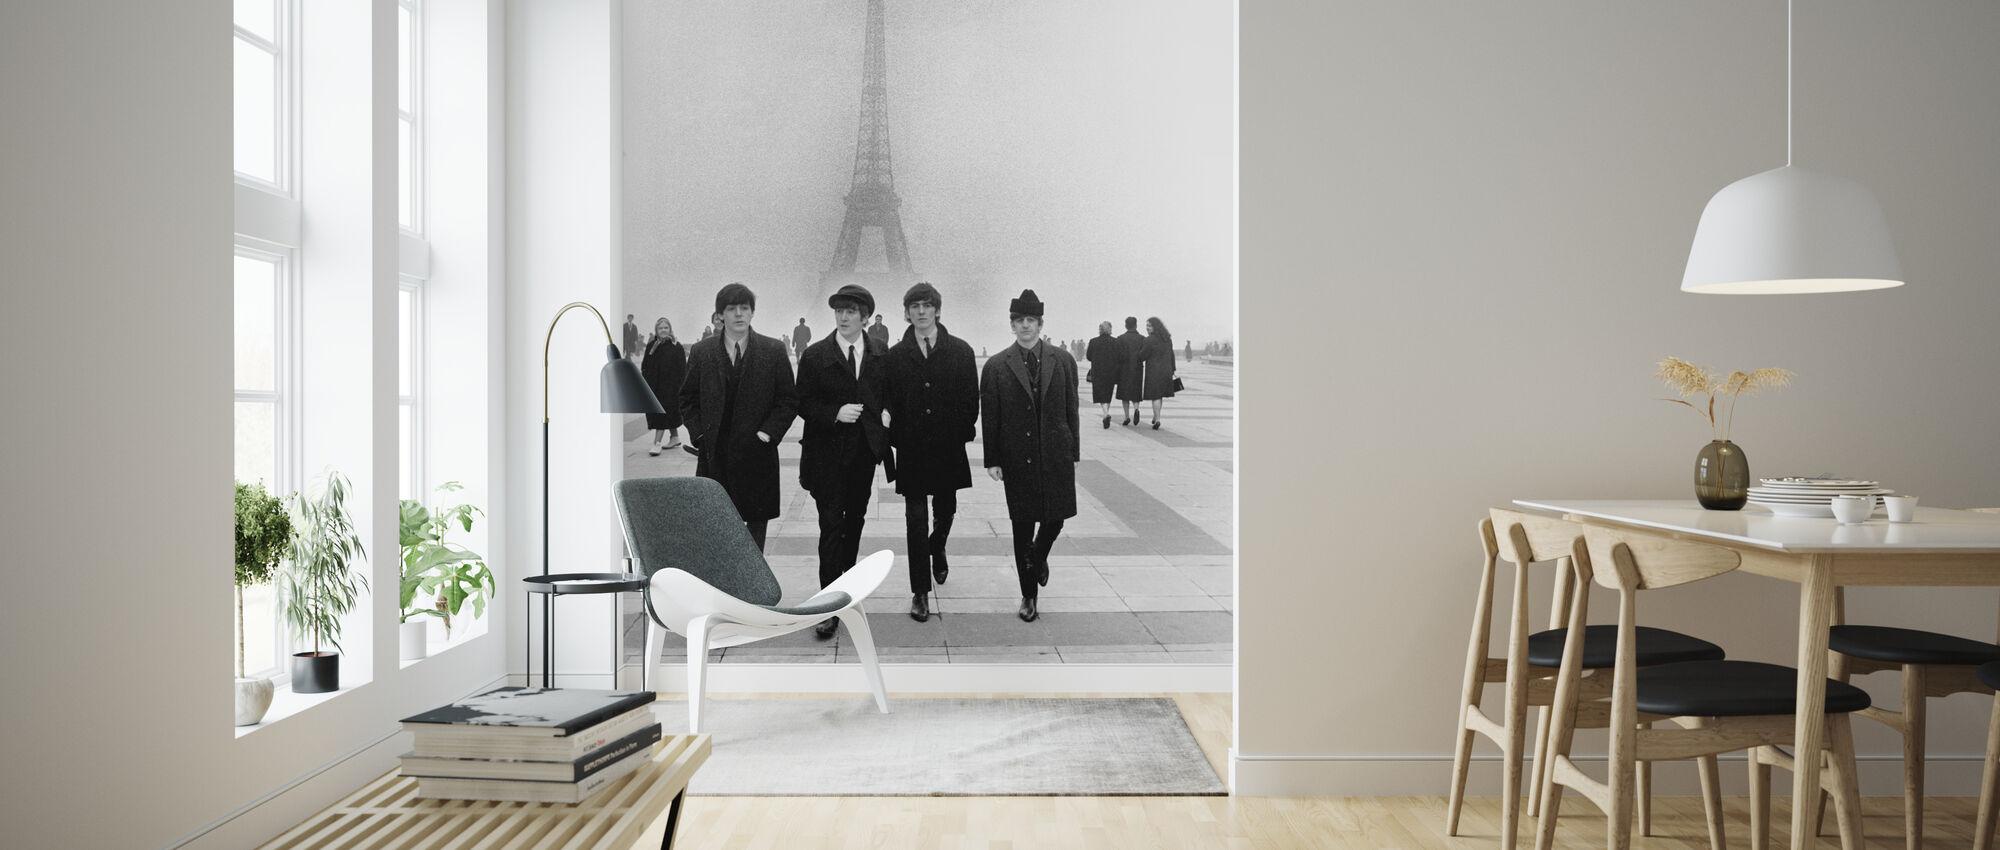 The Beatles - In Paris - Wallpaper - Living Room